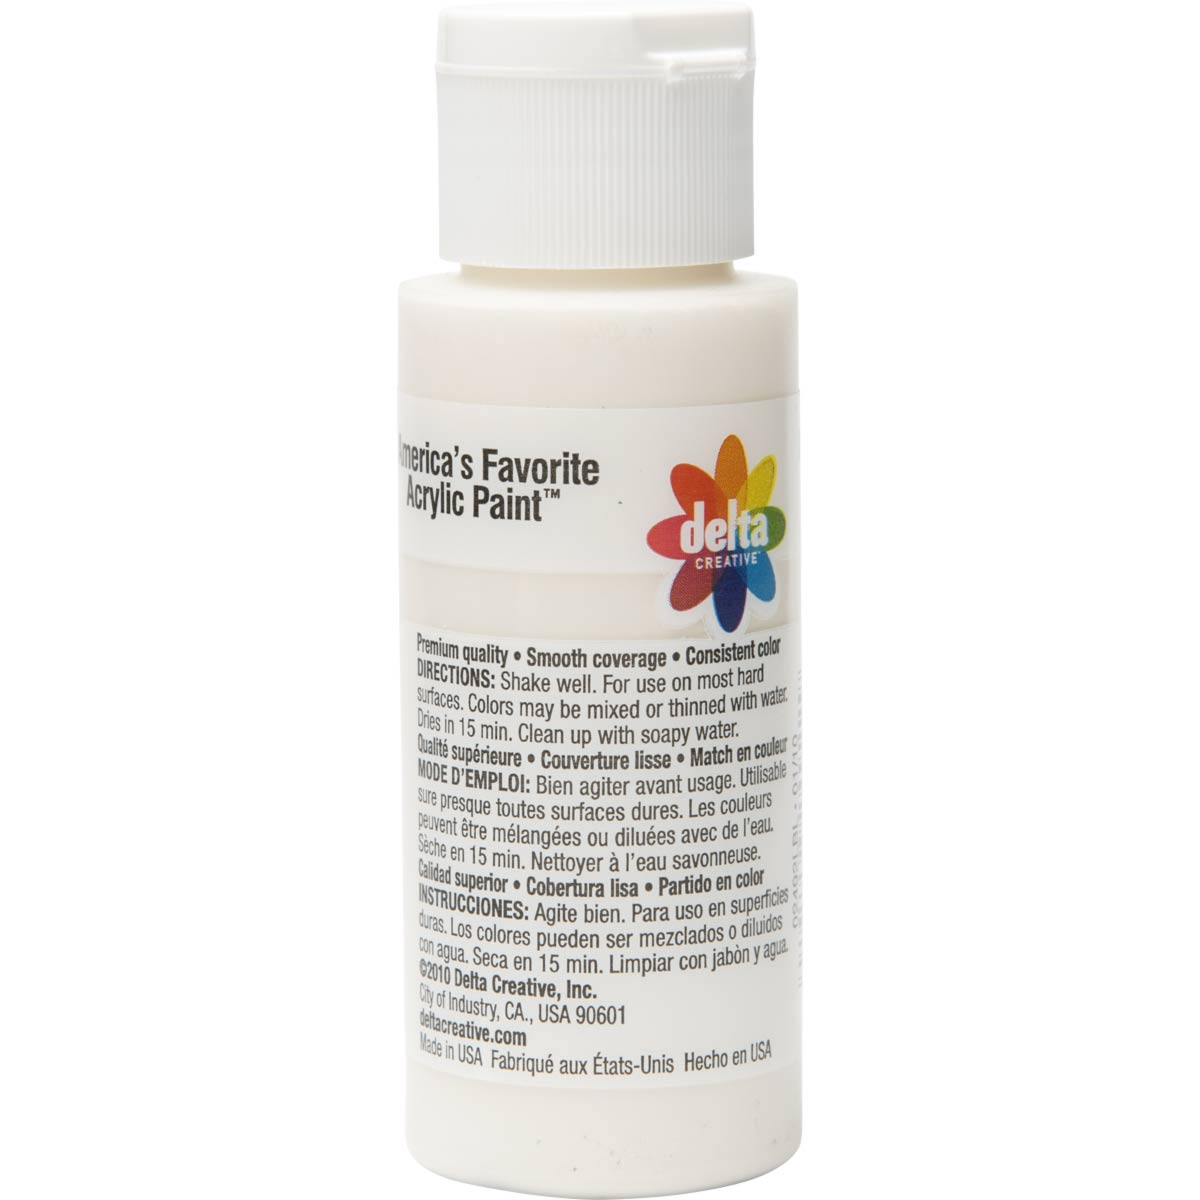 Delta Ceramcoat ® Acrylic Paint - Oyster White, 2 oz.